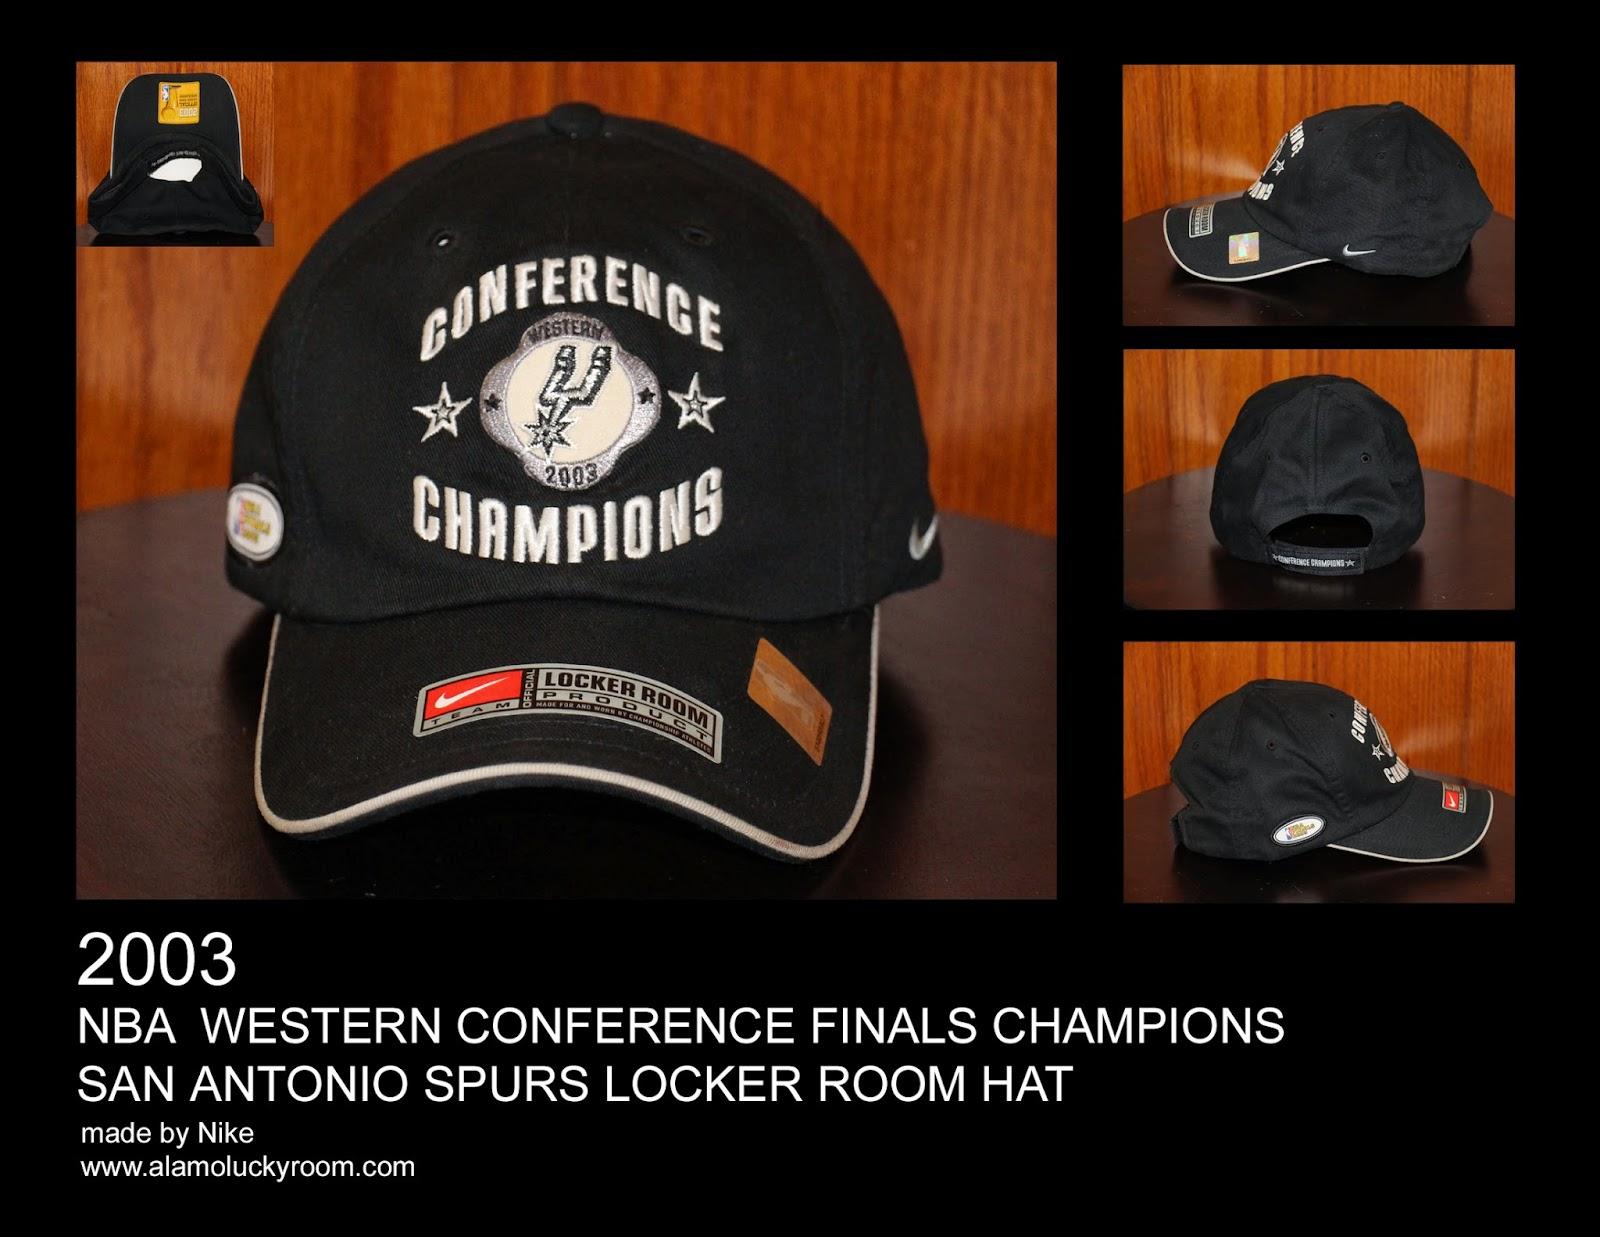 9fde9bf50e6 2003 San Antonio Spurs NBA Western Conference Finals Champions Locker Room  Hat